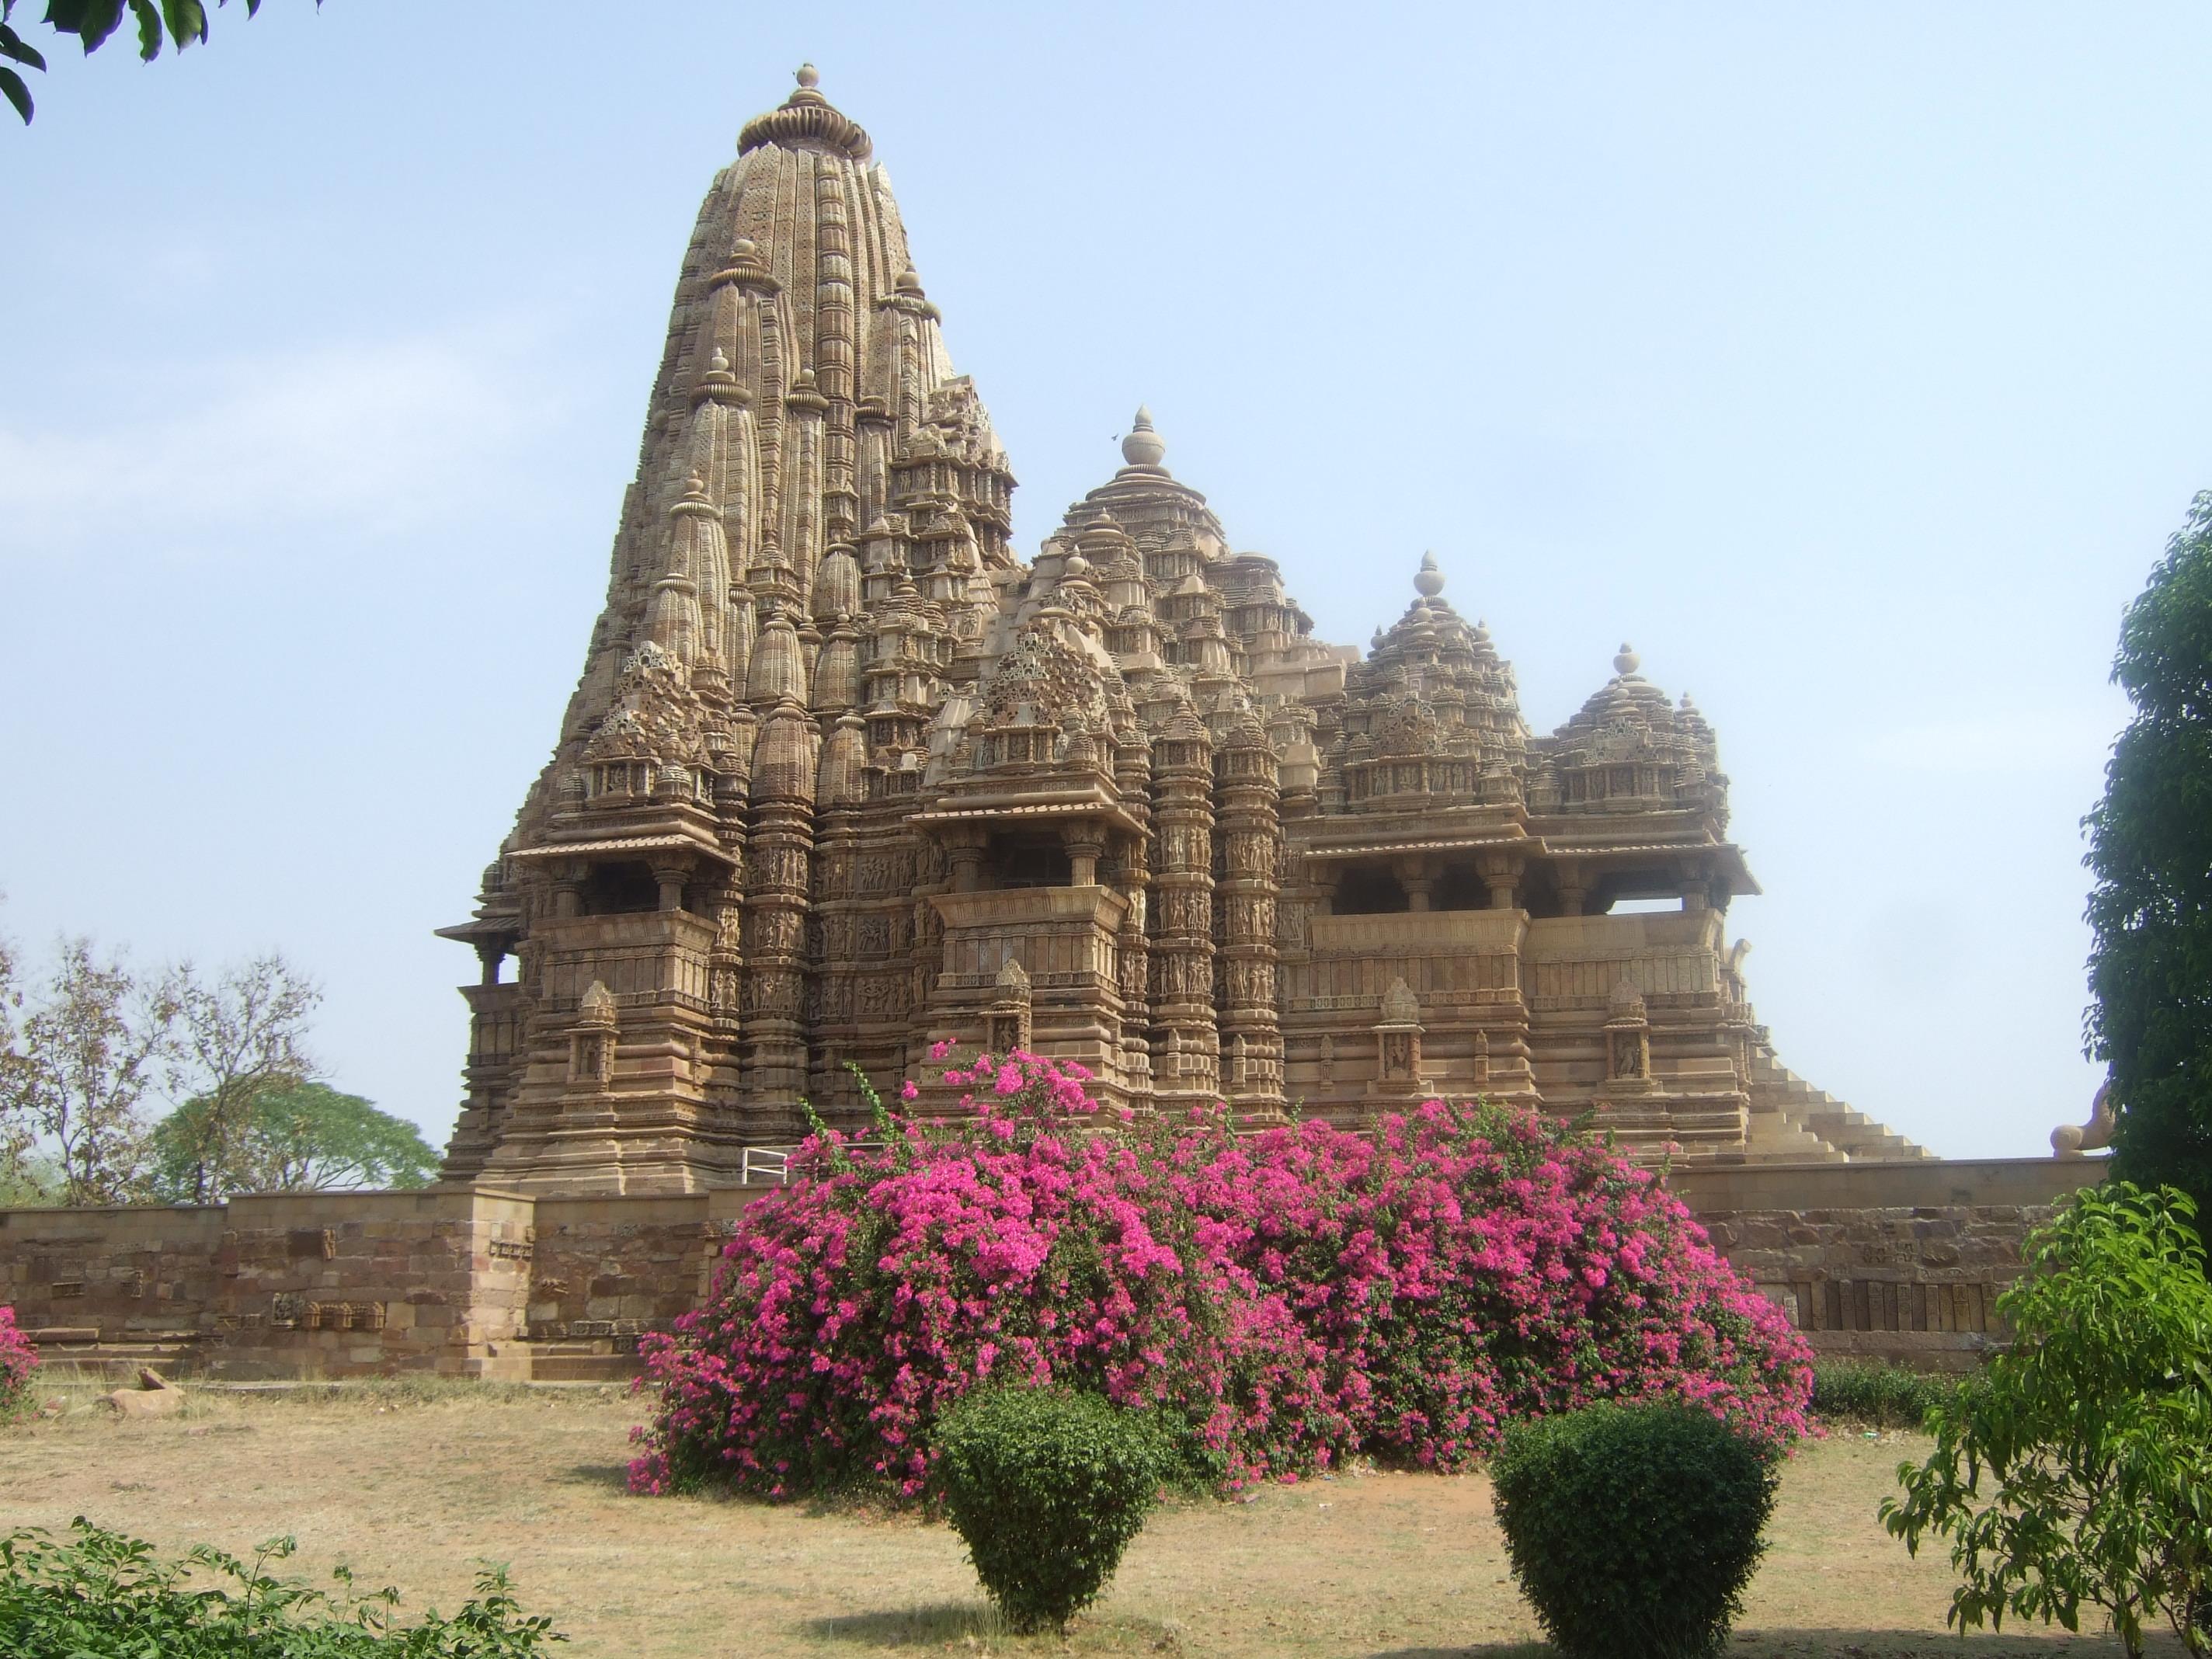 Leyenda del Templo de Khajuraho